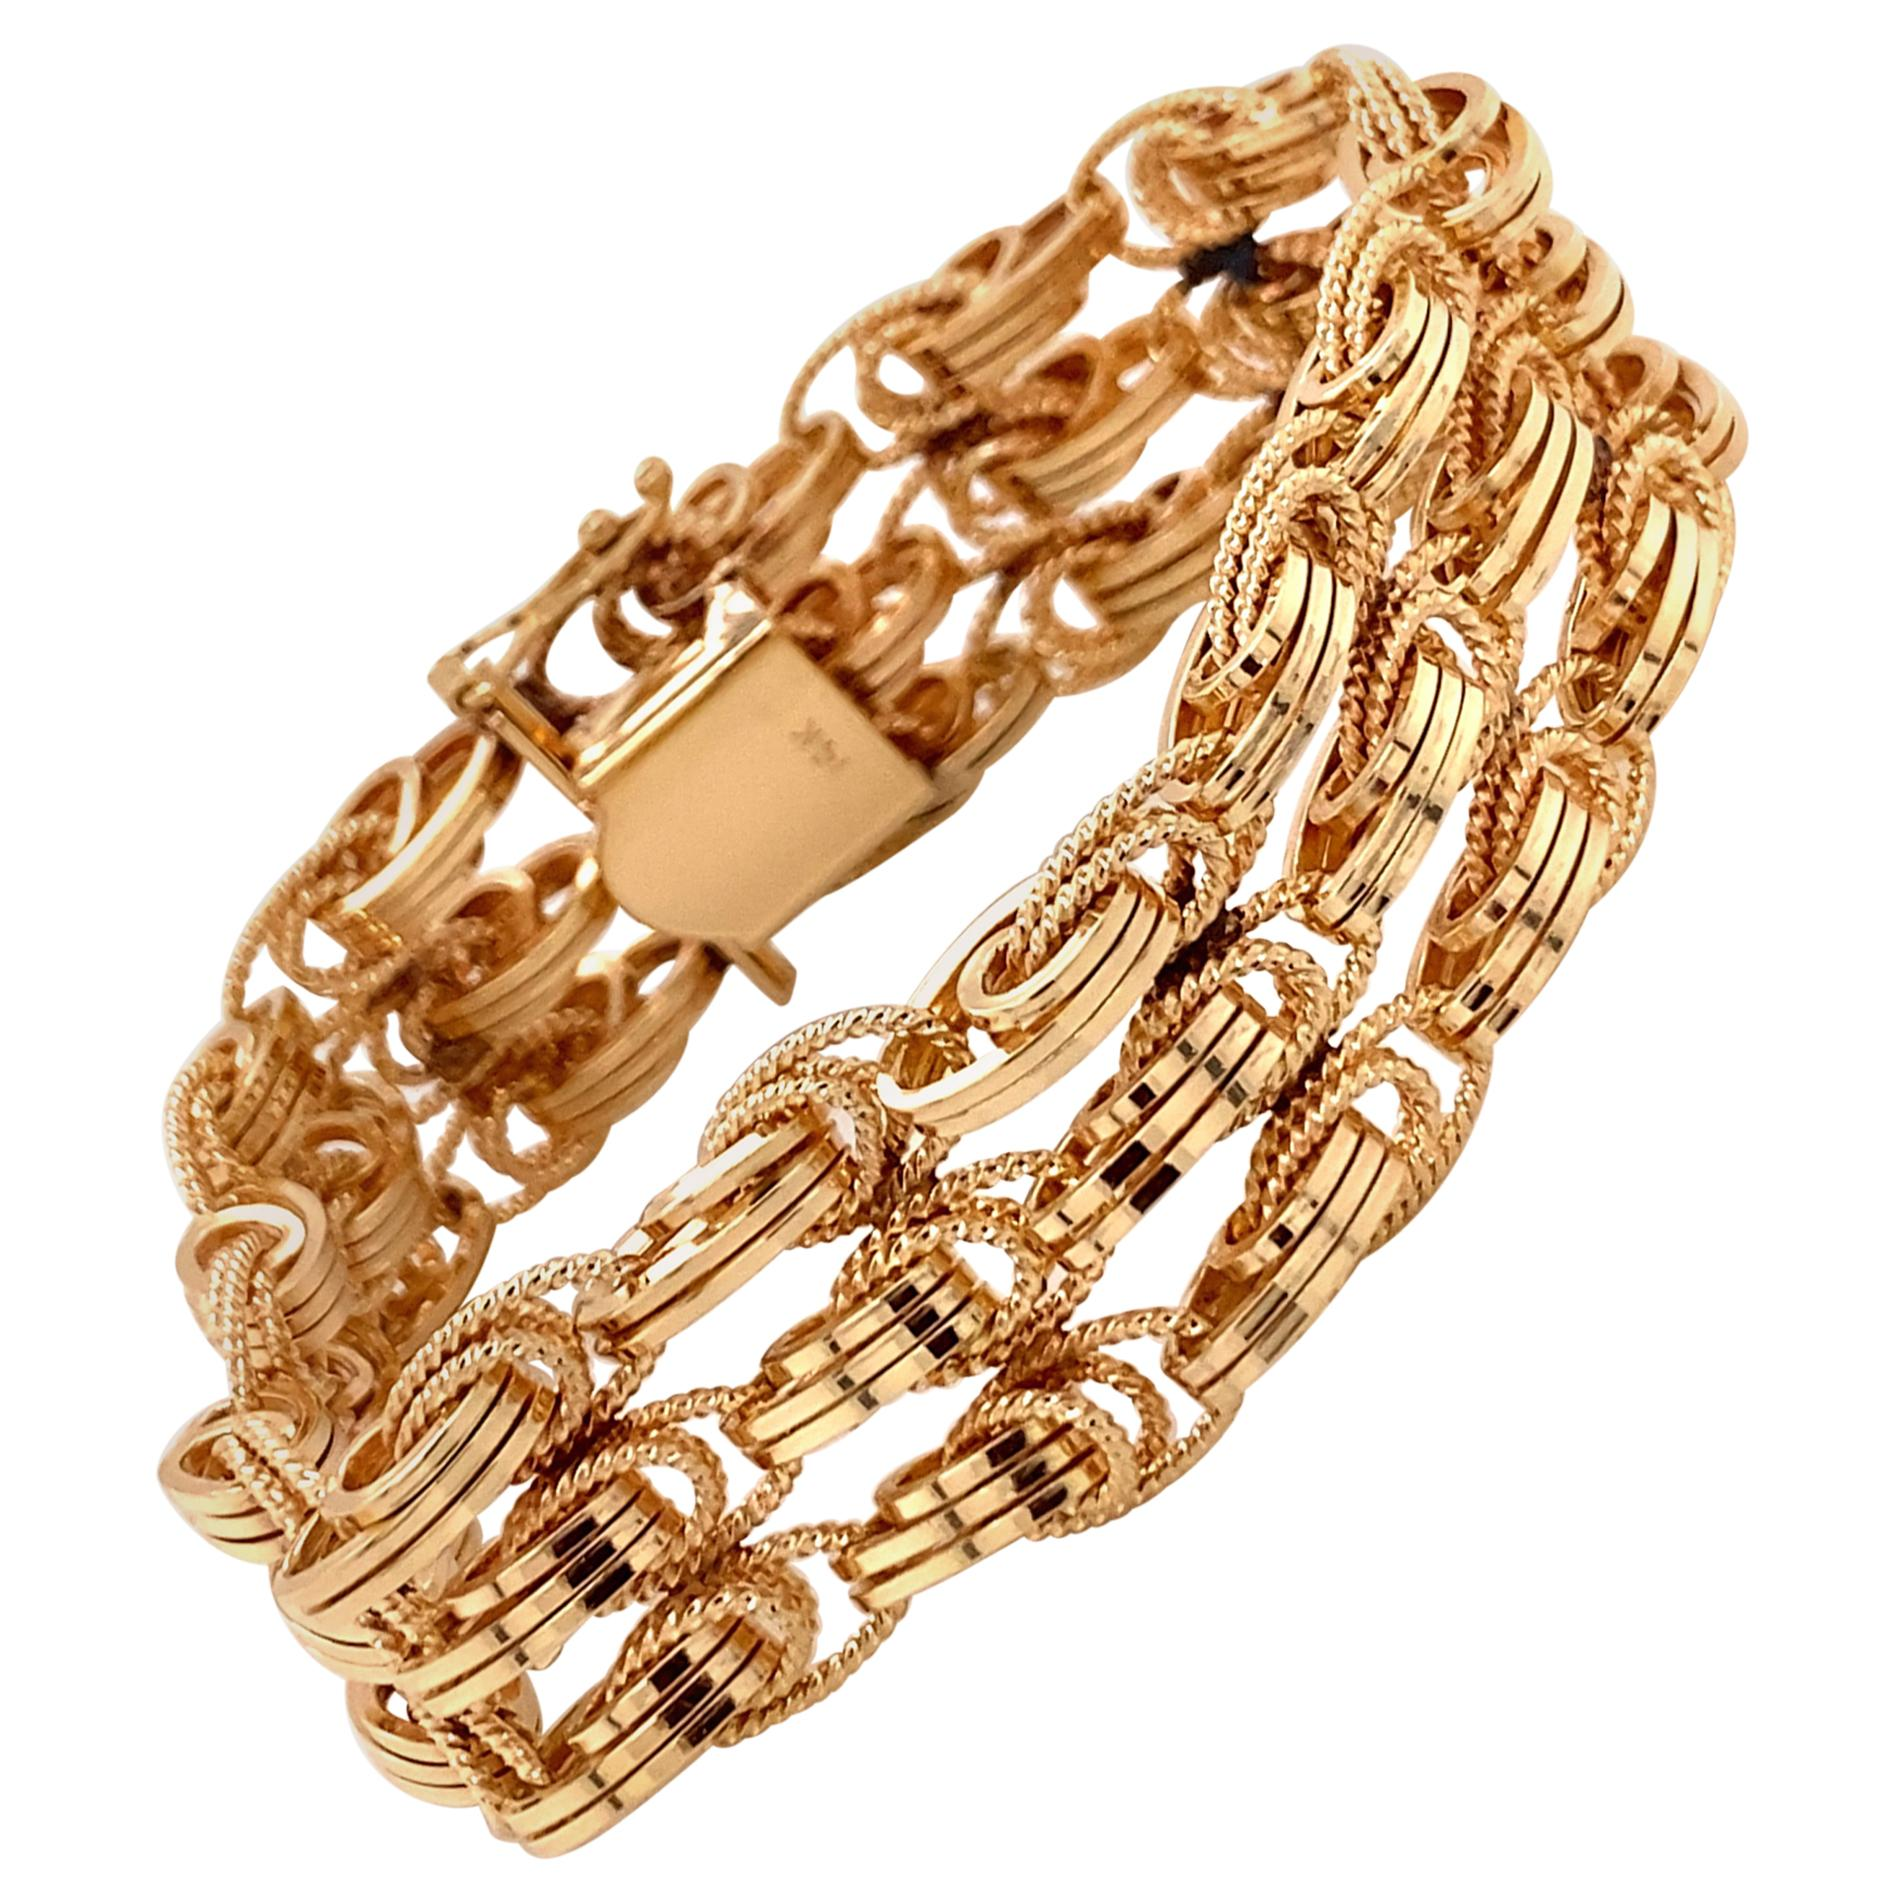 Vintage 1980s 14 Karat Yellow Gold 3-Row Wide Link Bracelet